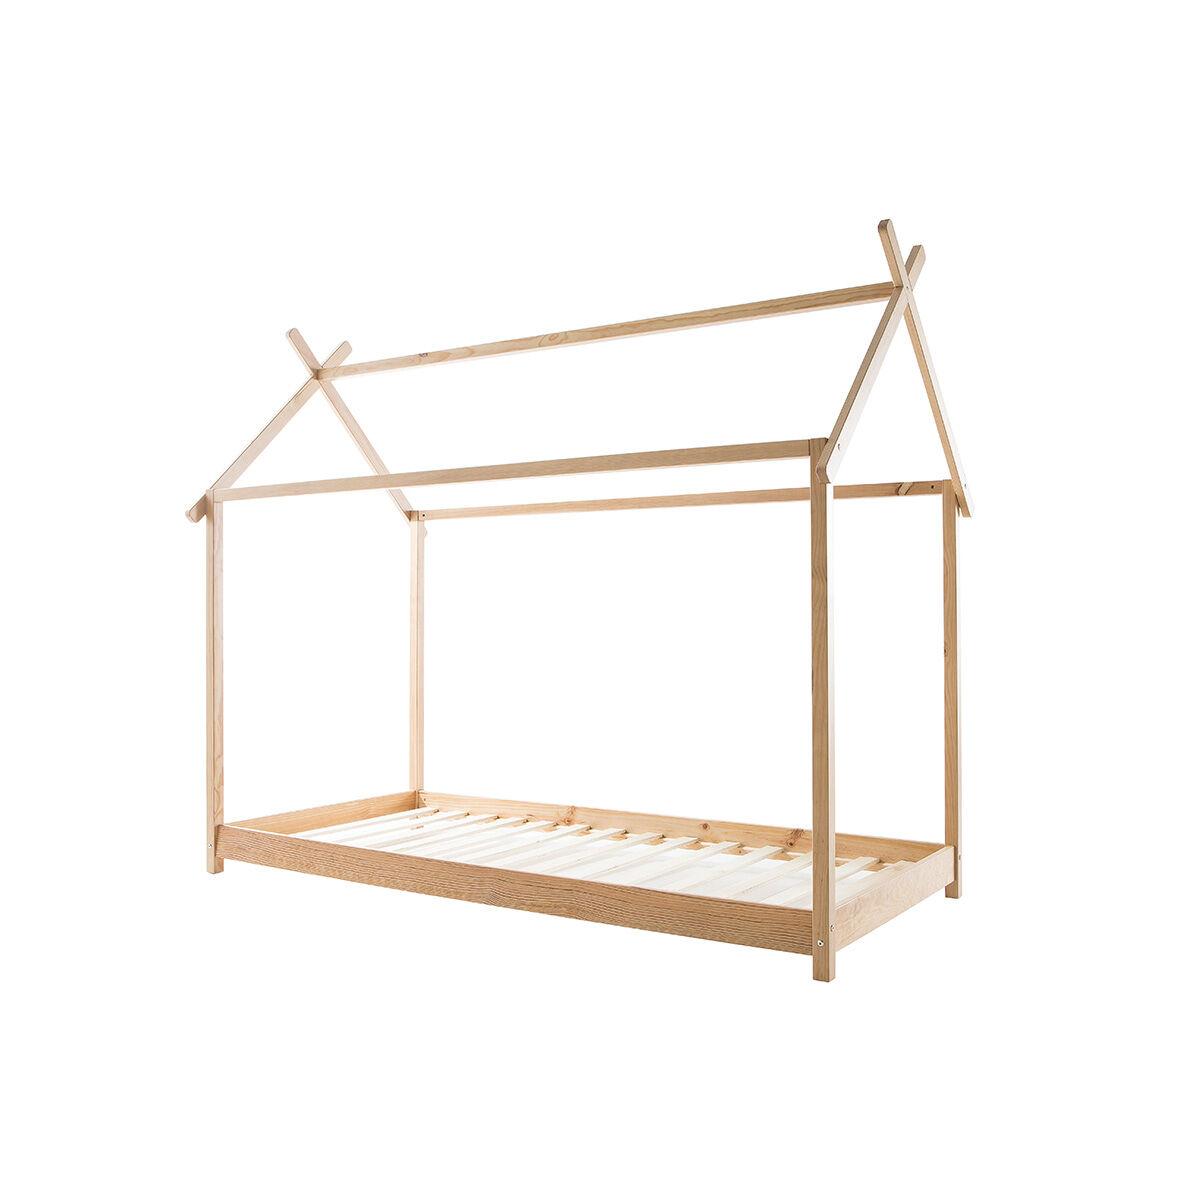 Miliboo Lit cabane enfant avec sommier 90 x 200 cm en bois KBANE